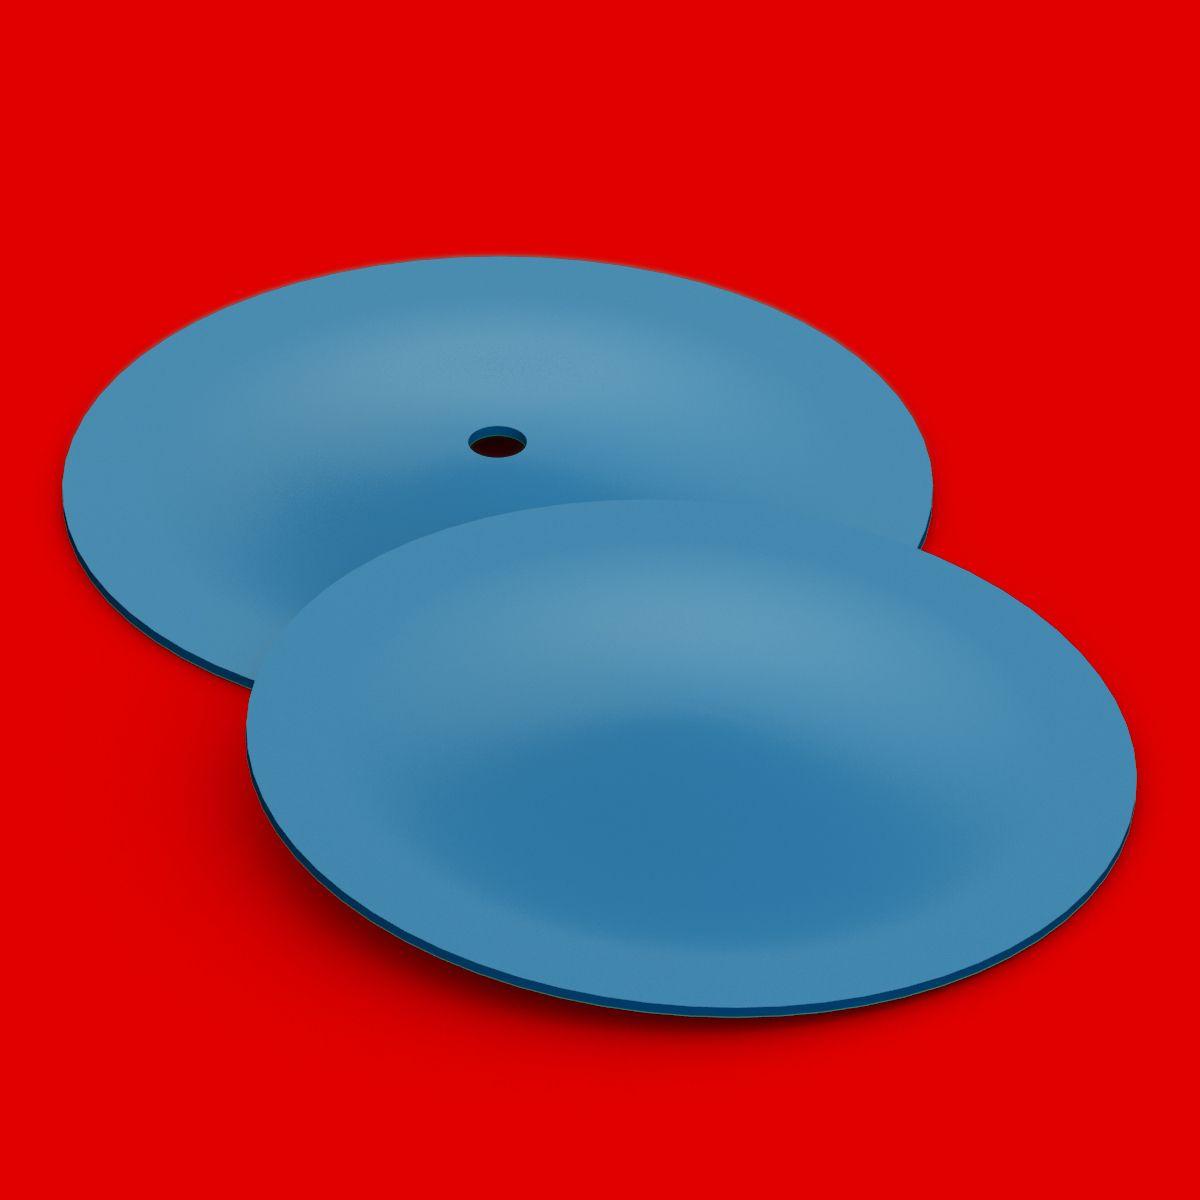 TFC Schleuderguss HTV Silikon Scheibenset HB 580C 300x15mm blau